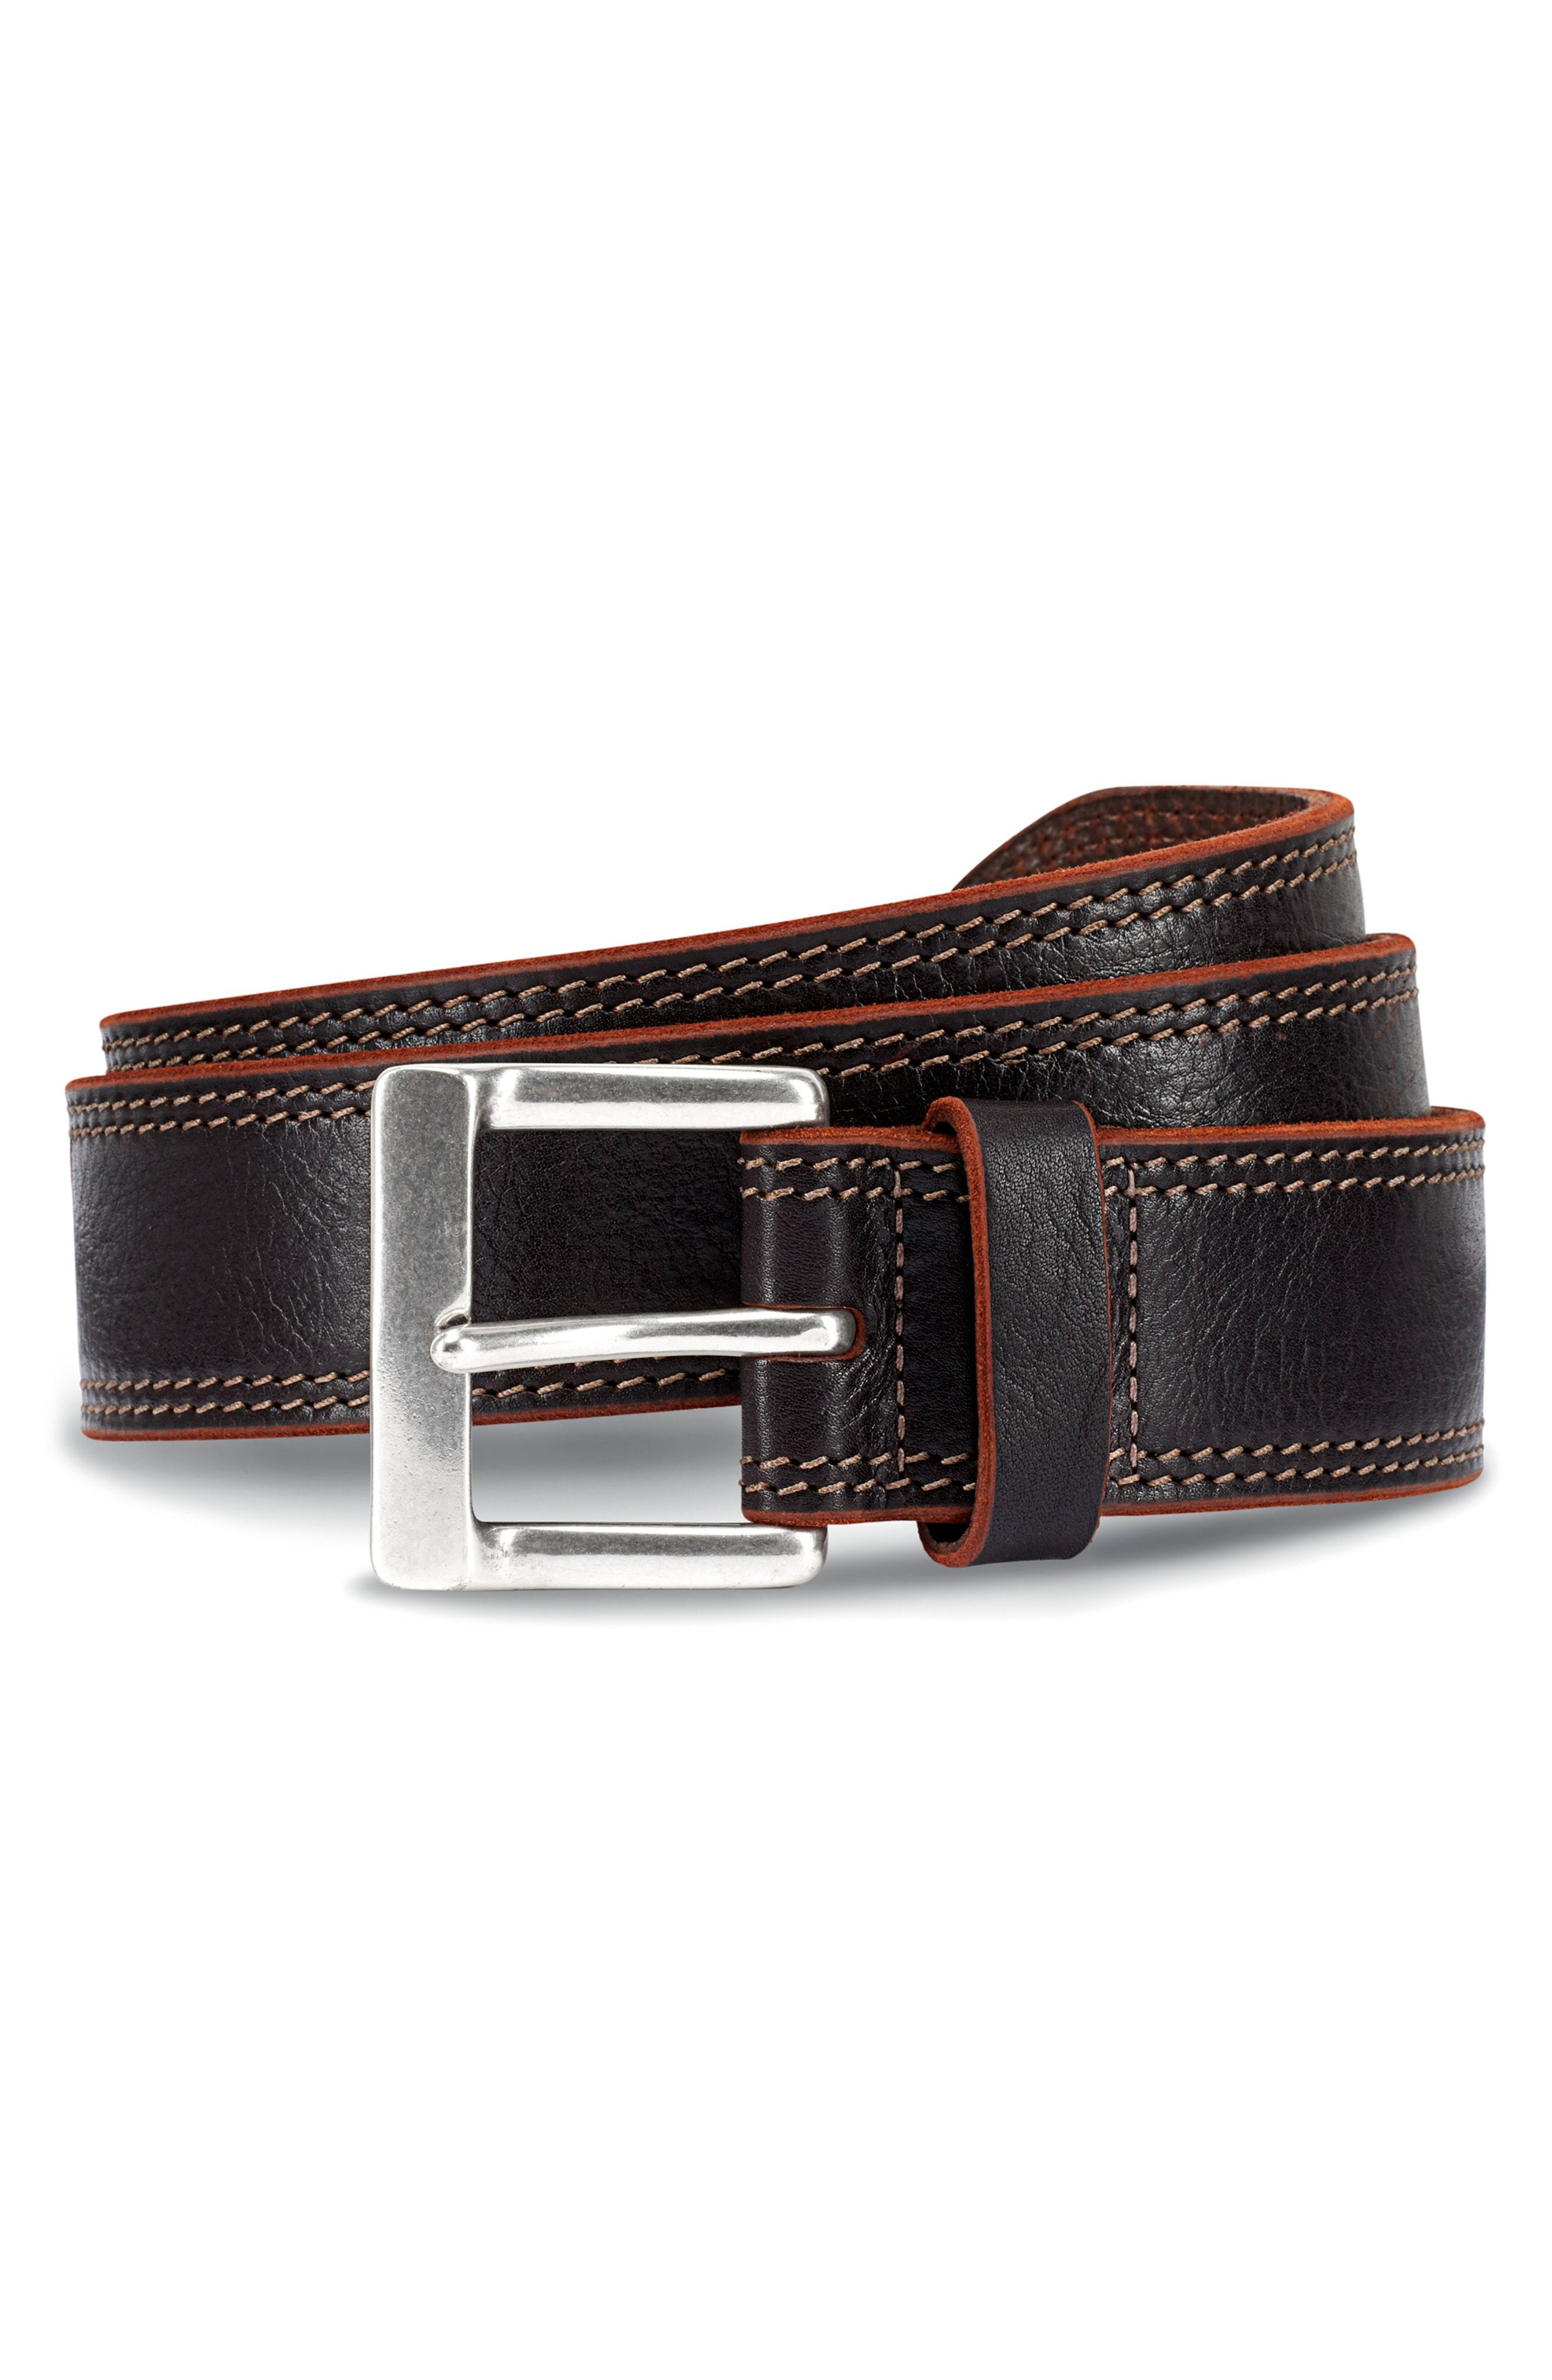 Allen Edmonds Quay Avenue Leather Belt